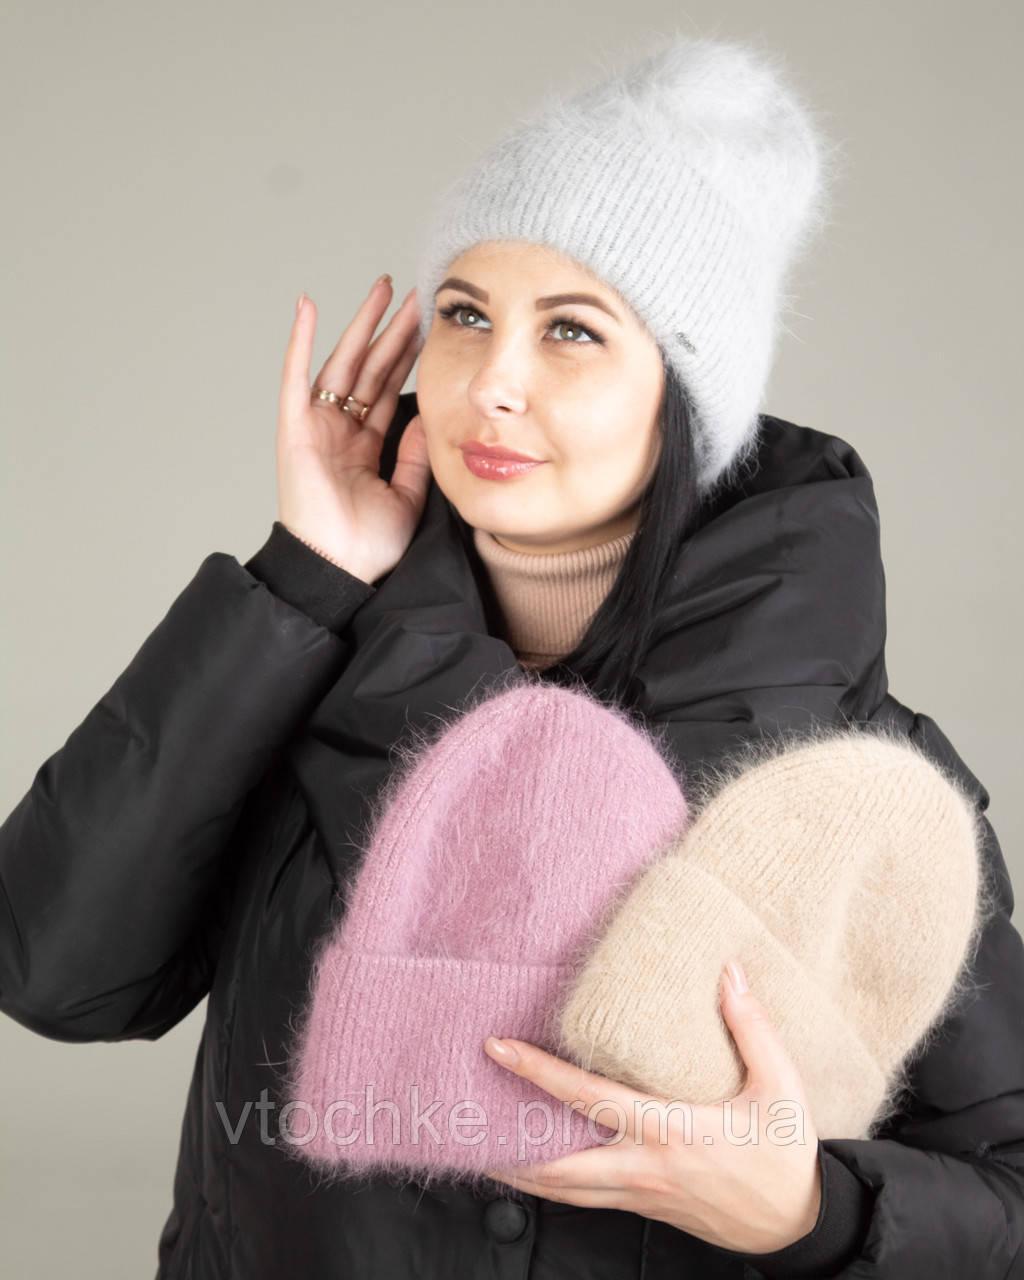 Жіноча ангорова шапка